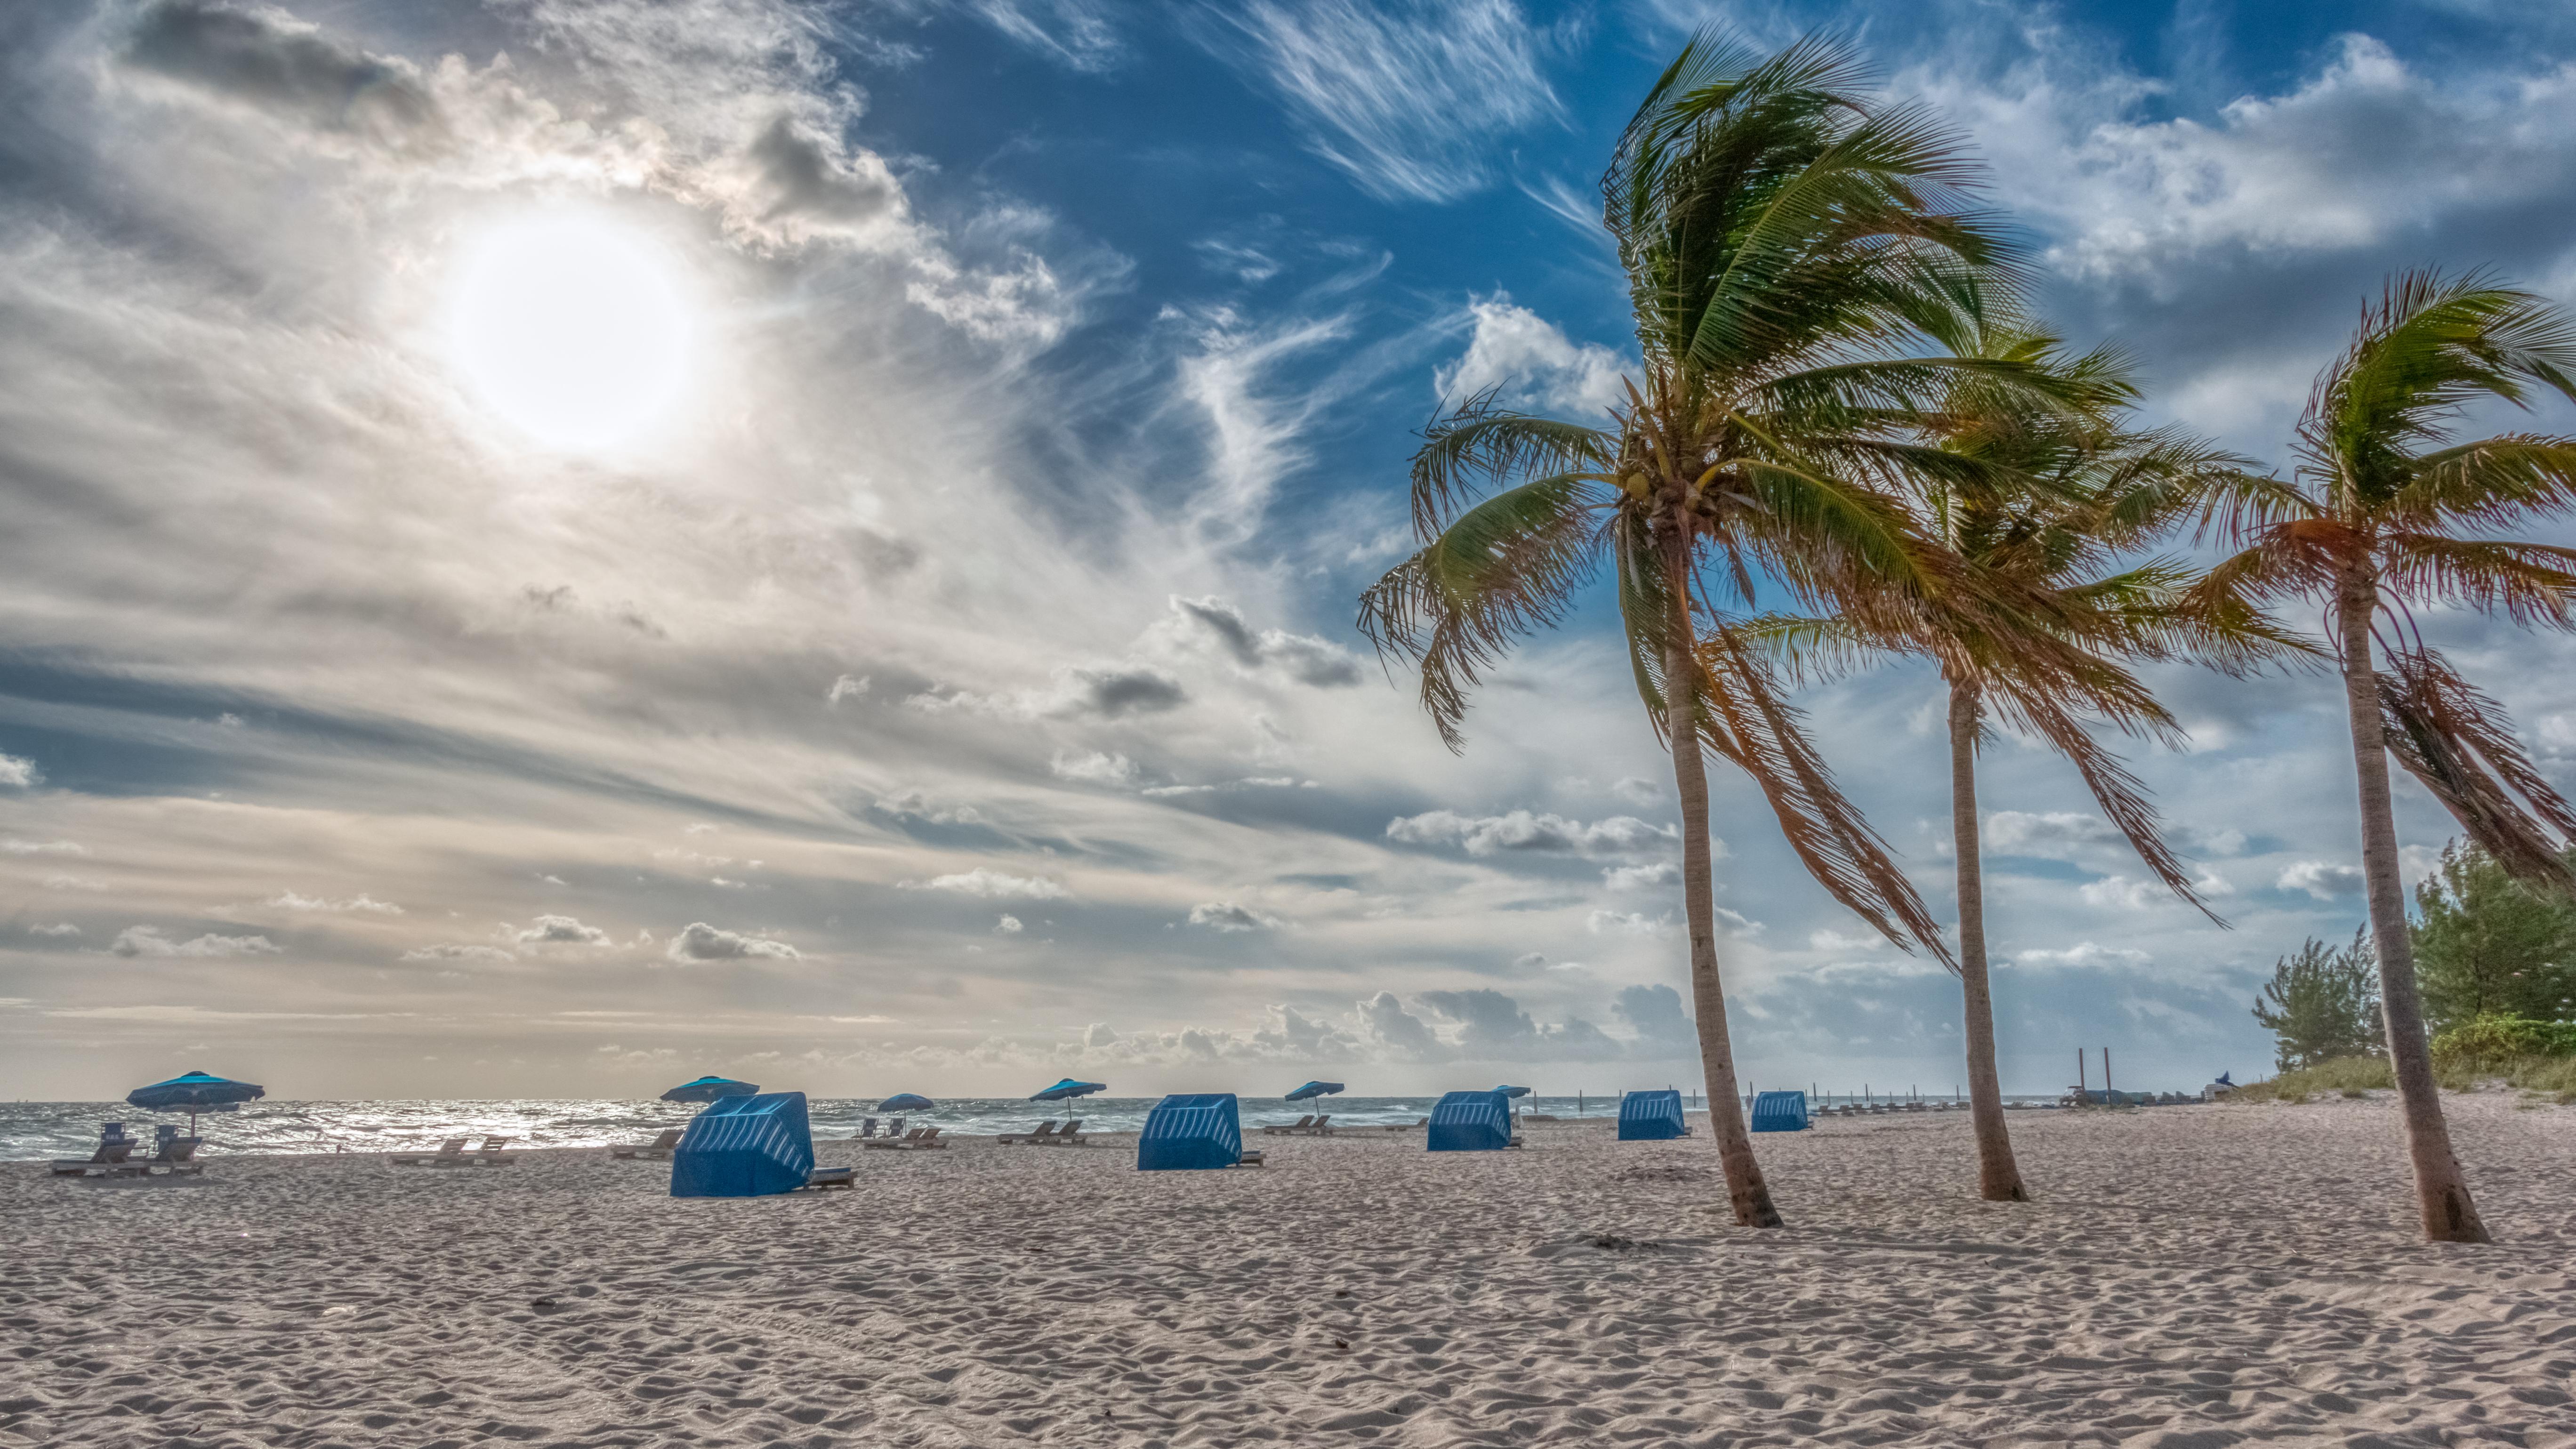 Amrit Ocean Resort & Residences | Singer Island | Florida